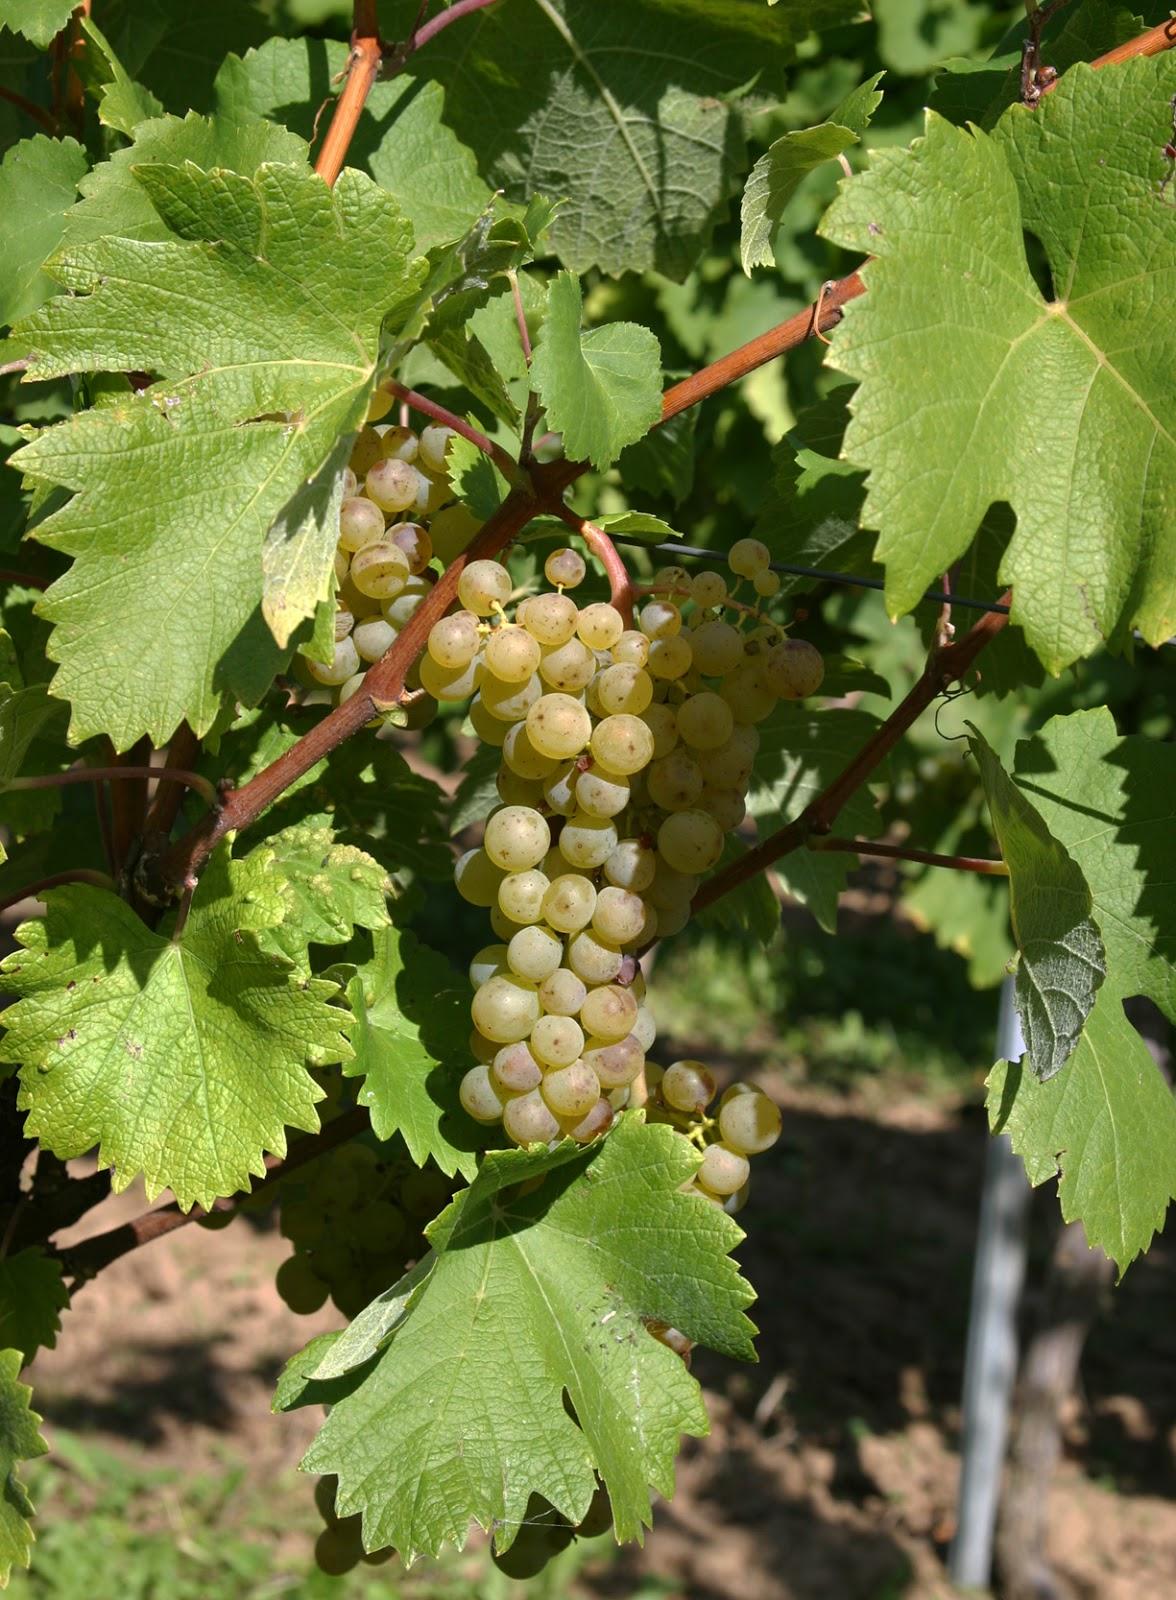 Fringe Wine: Huxelrebe - Rheinhessen, Germany